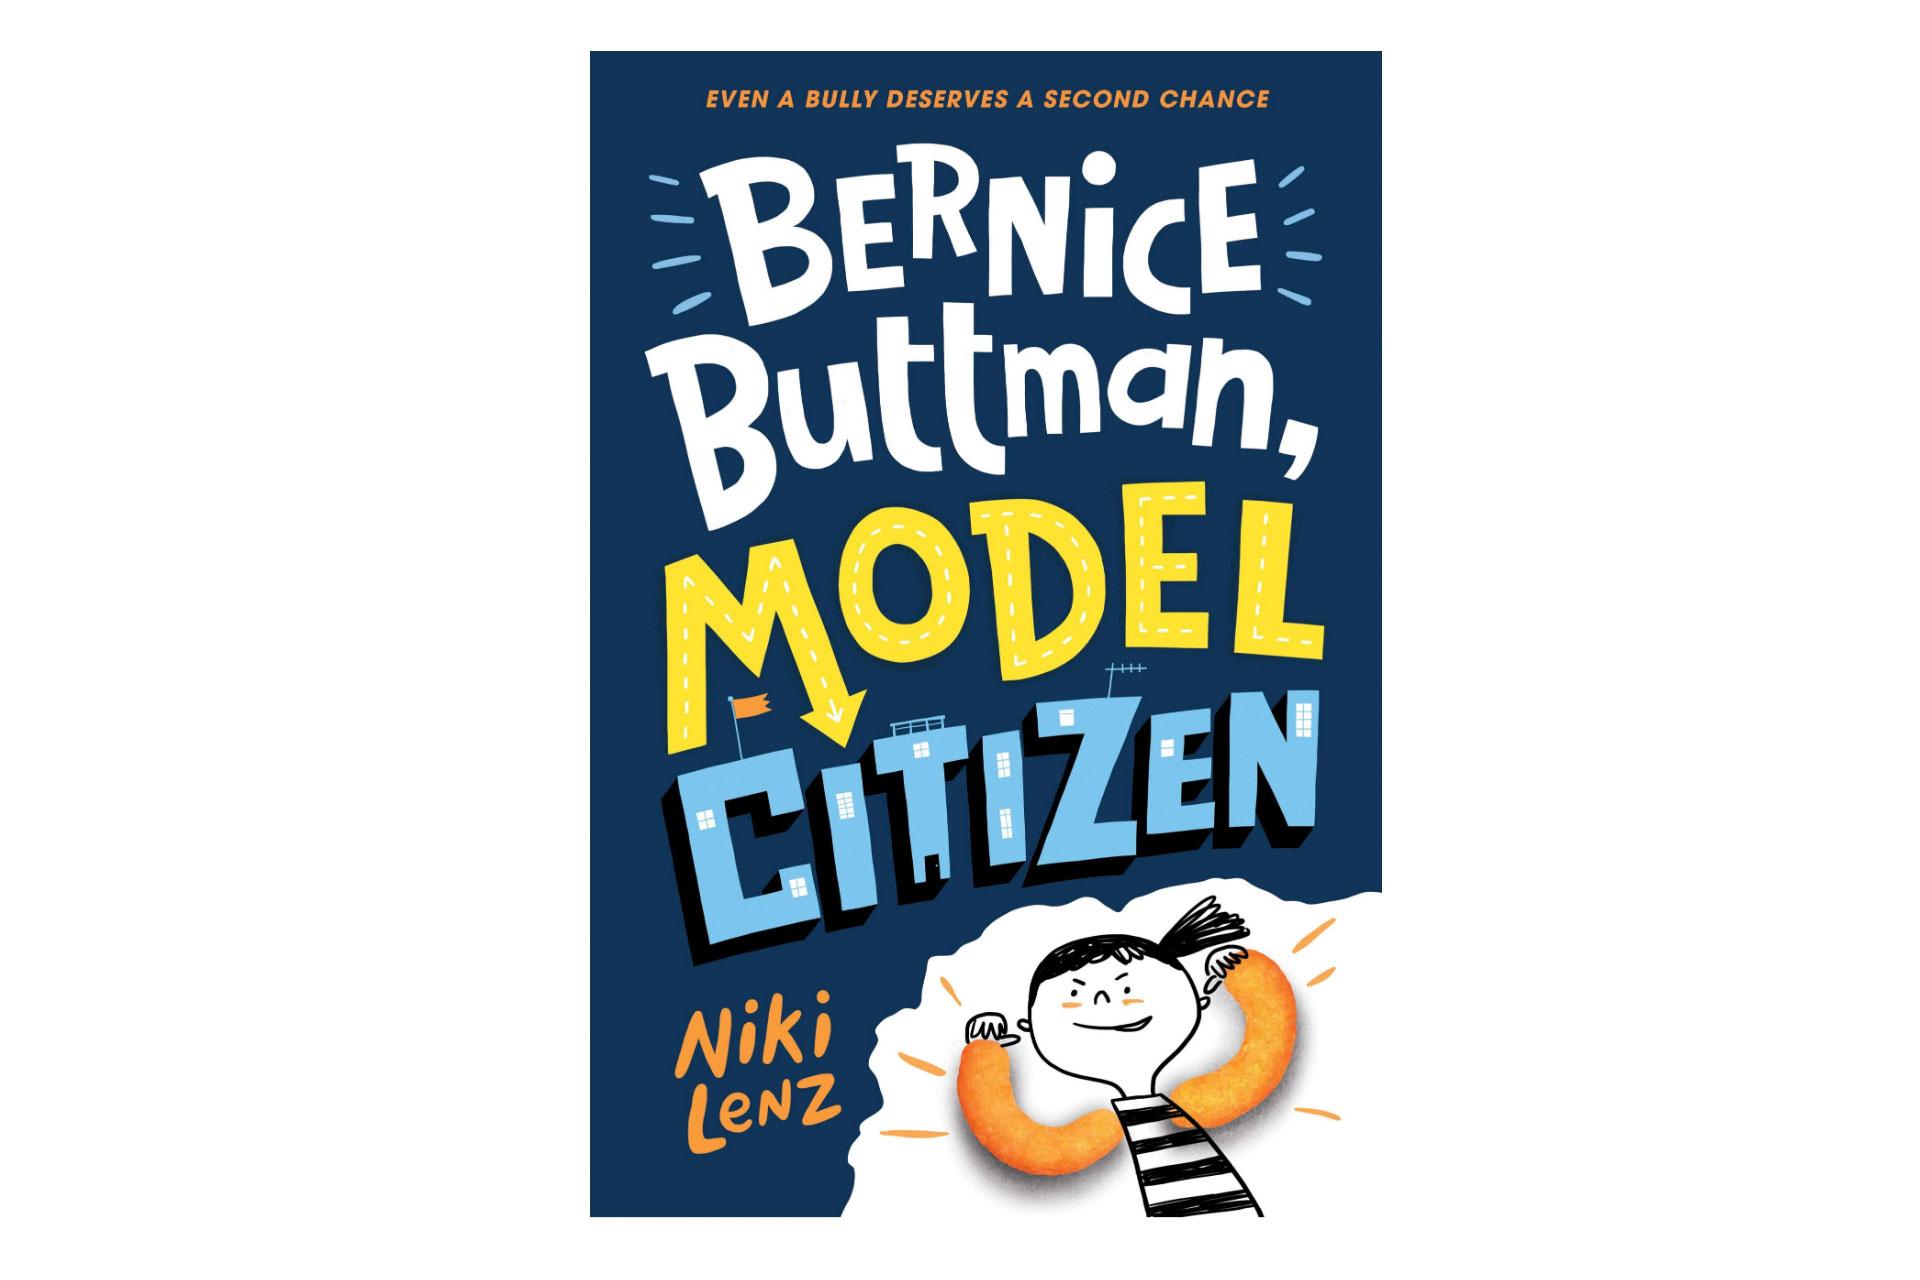 Bernice Buttman, Model Citizen Book; Courtesy of Amazon